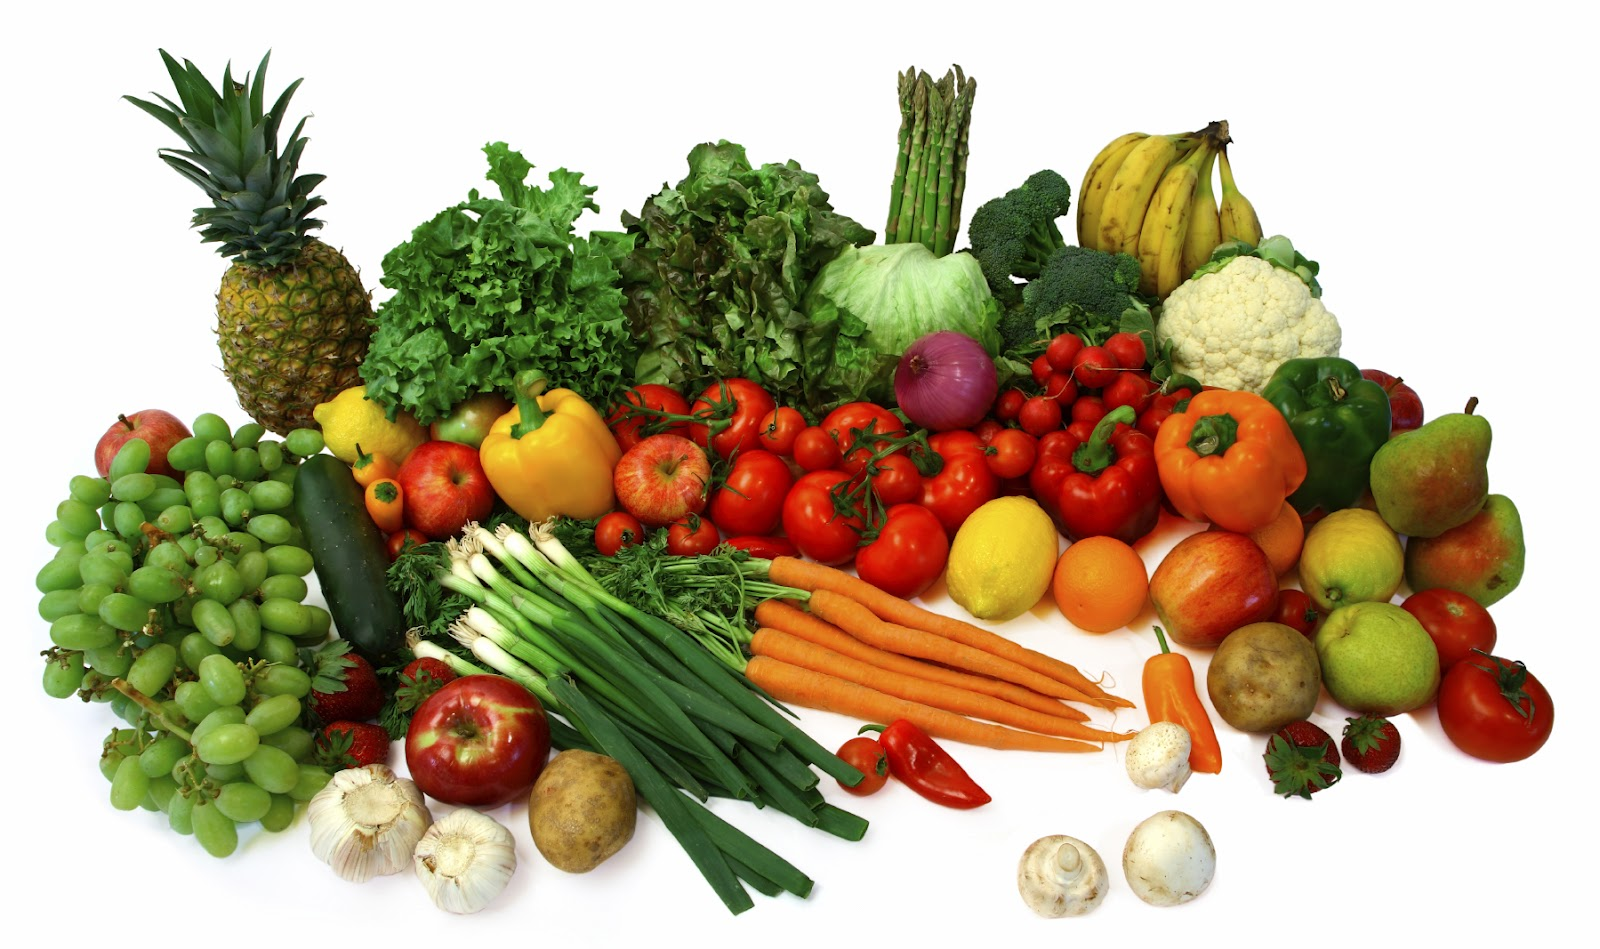 Minerales medicina alternativa - Alimentos adelgazantes naturales ...